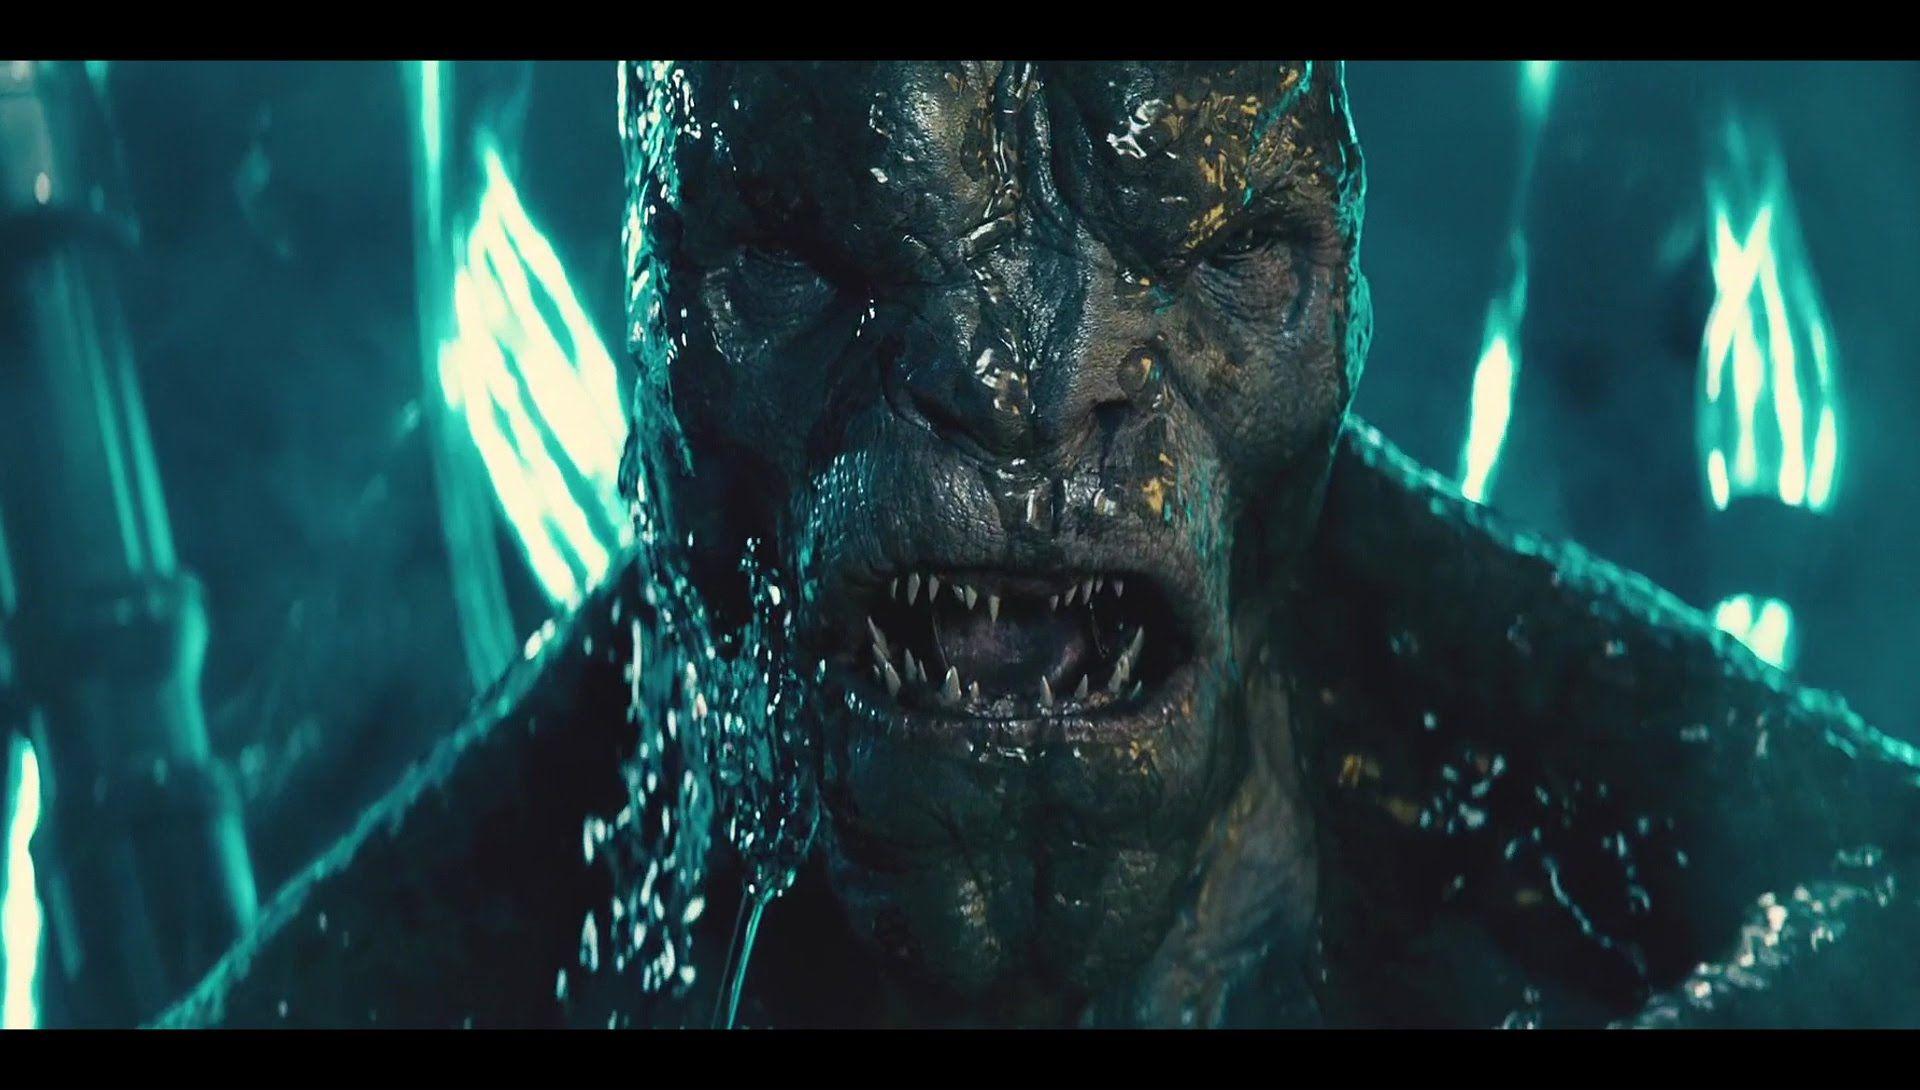 batman v superman ''lex luthor creates superman's doomsday'' 1080p